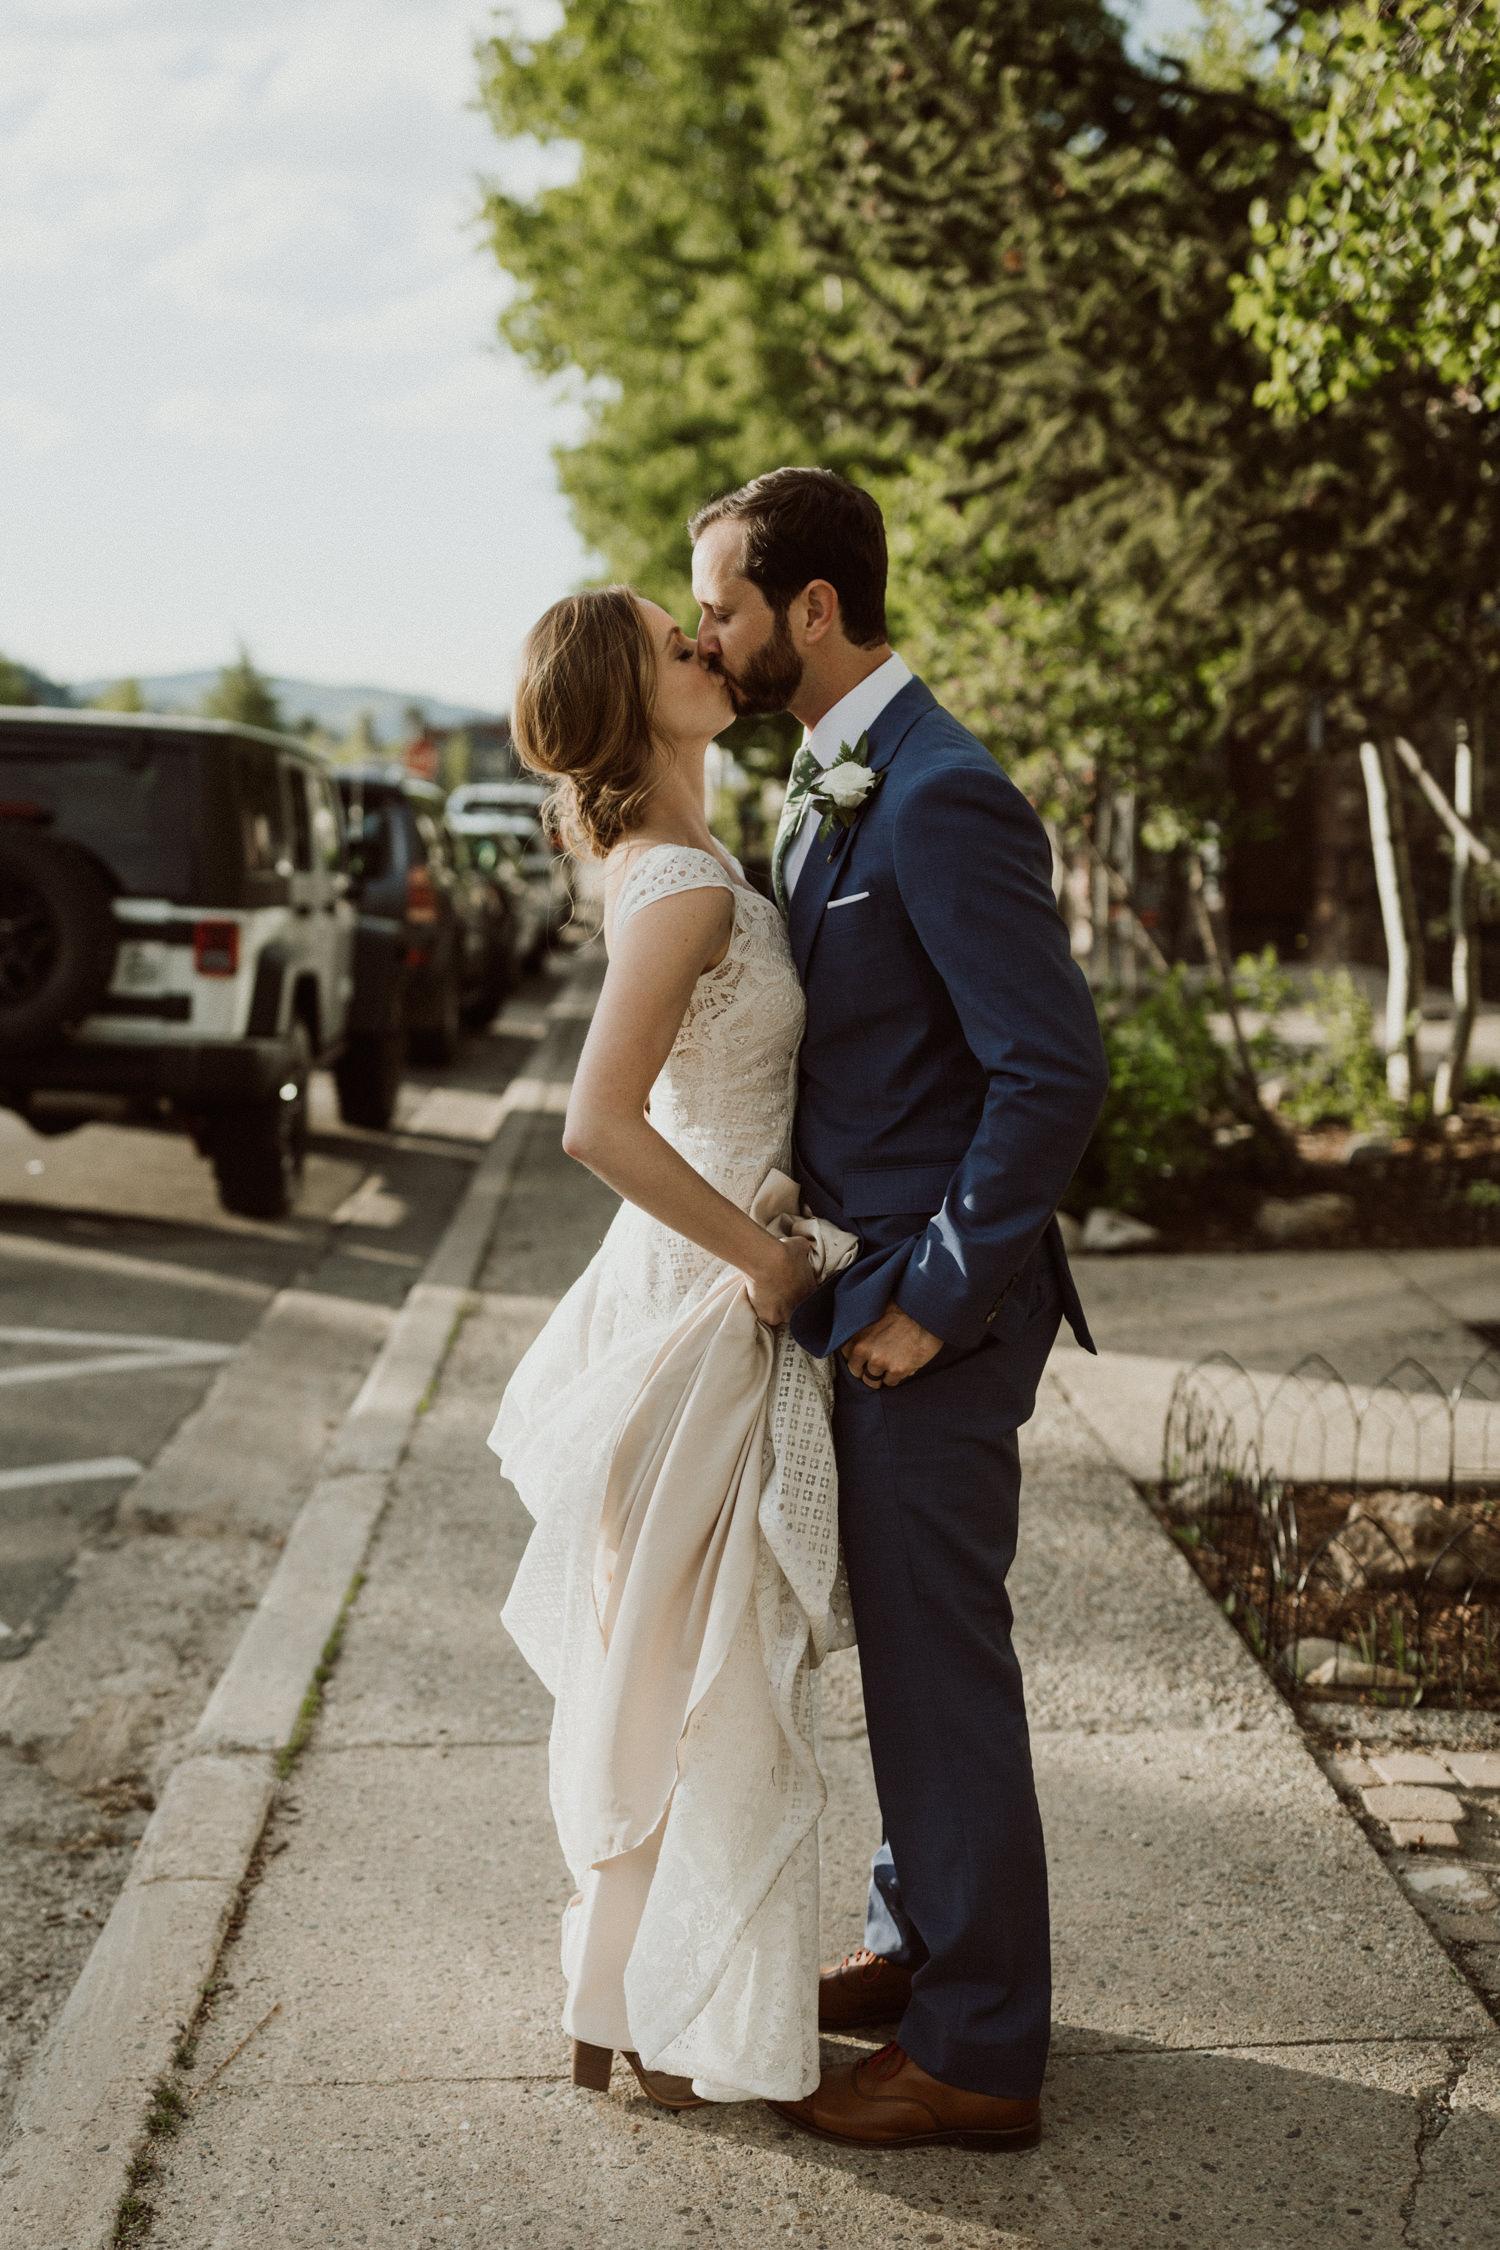 bohemian-backyard-wedding-breckenridge-colorado-91.jpg